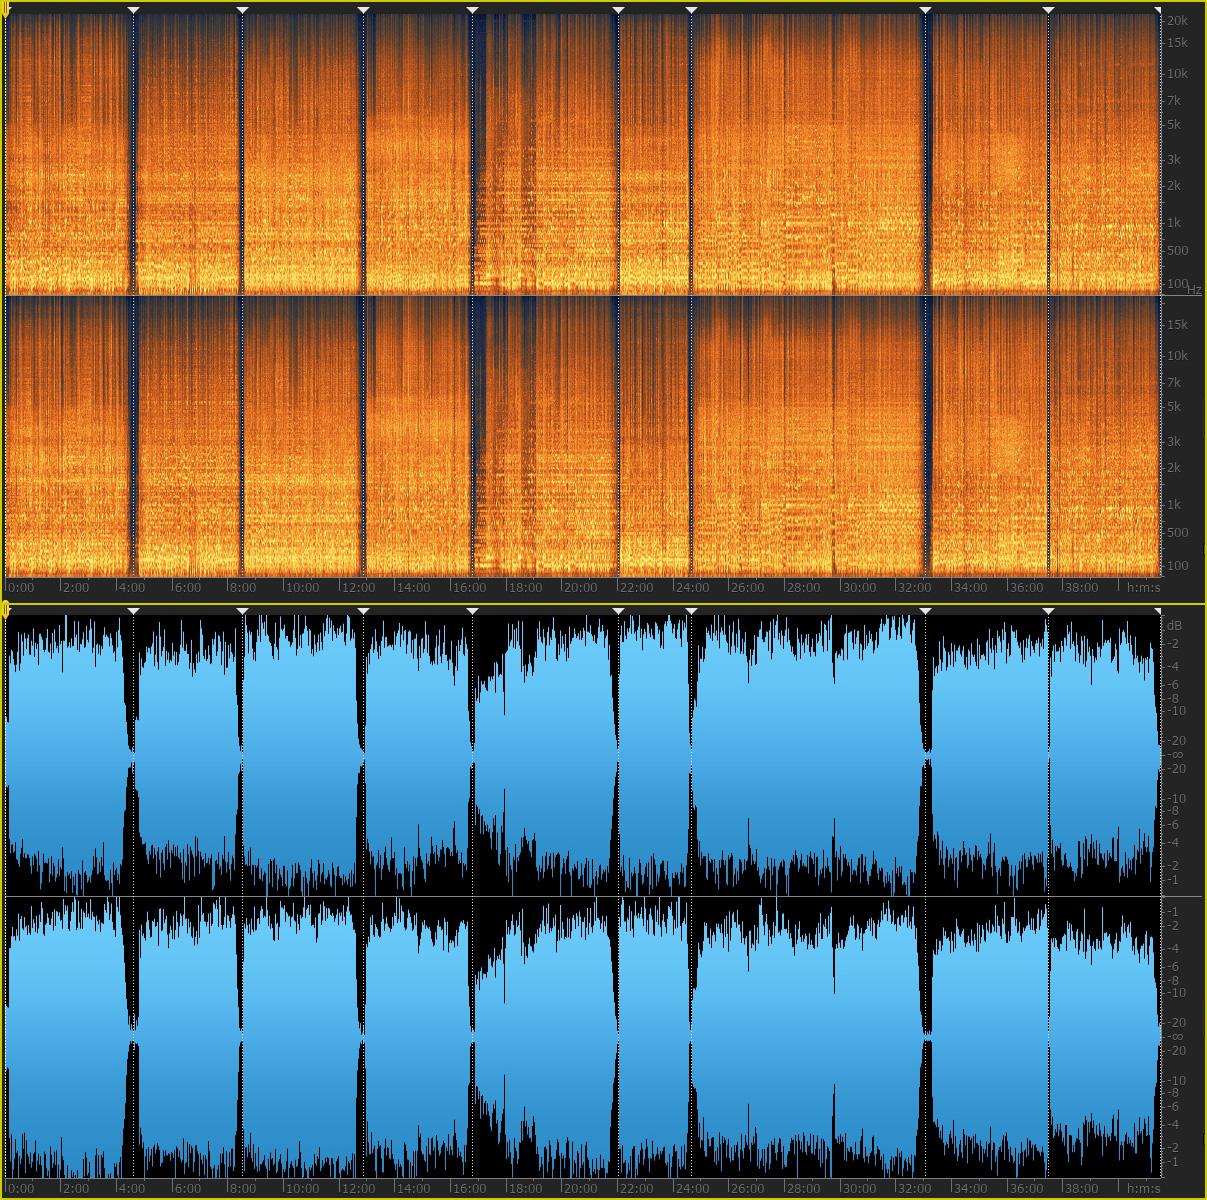 Rainbow89Compilation_Spectrogram.jpg